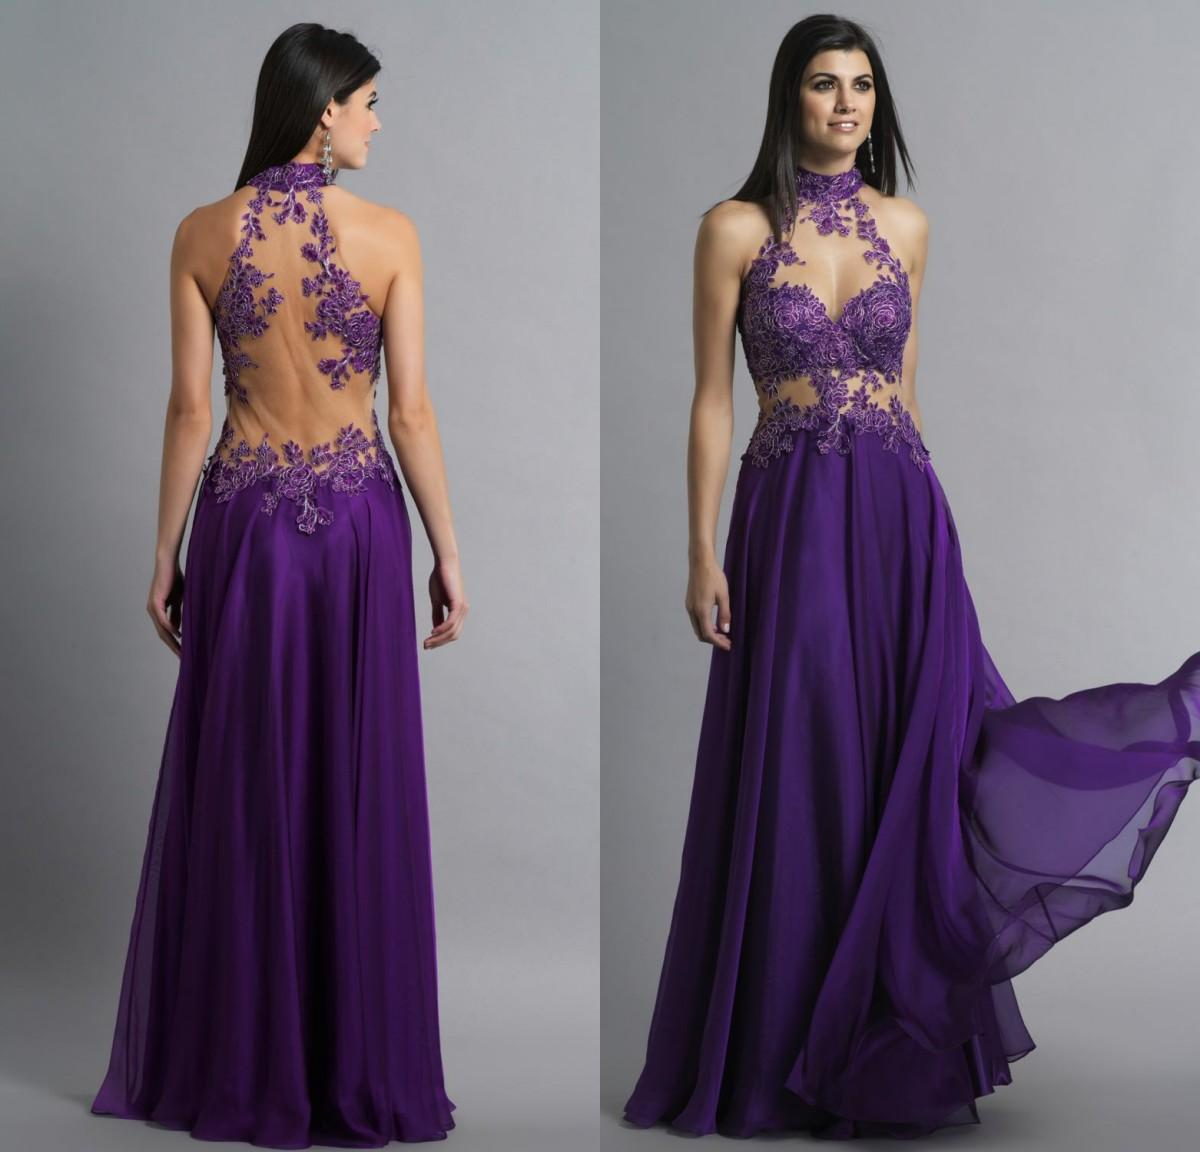 Prom Dresses In Indianapolis